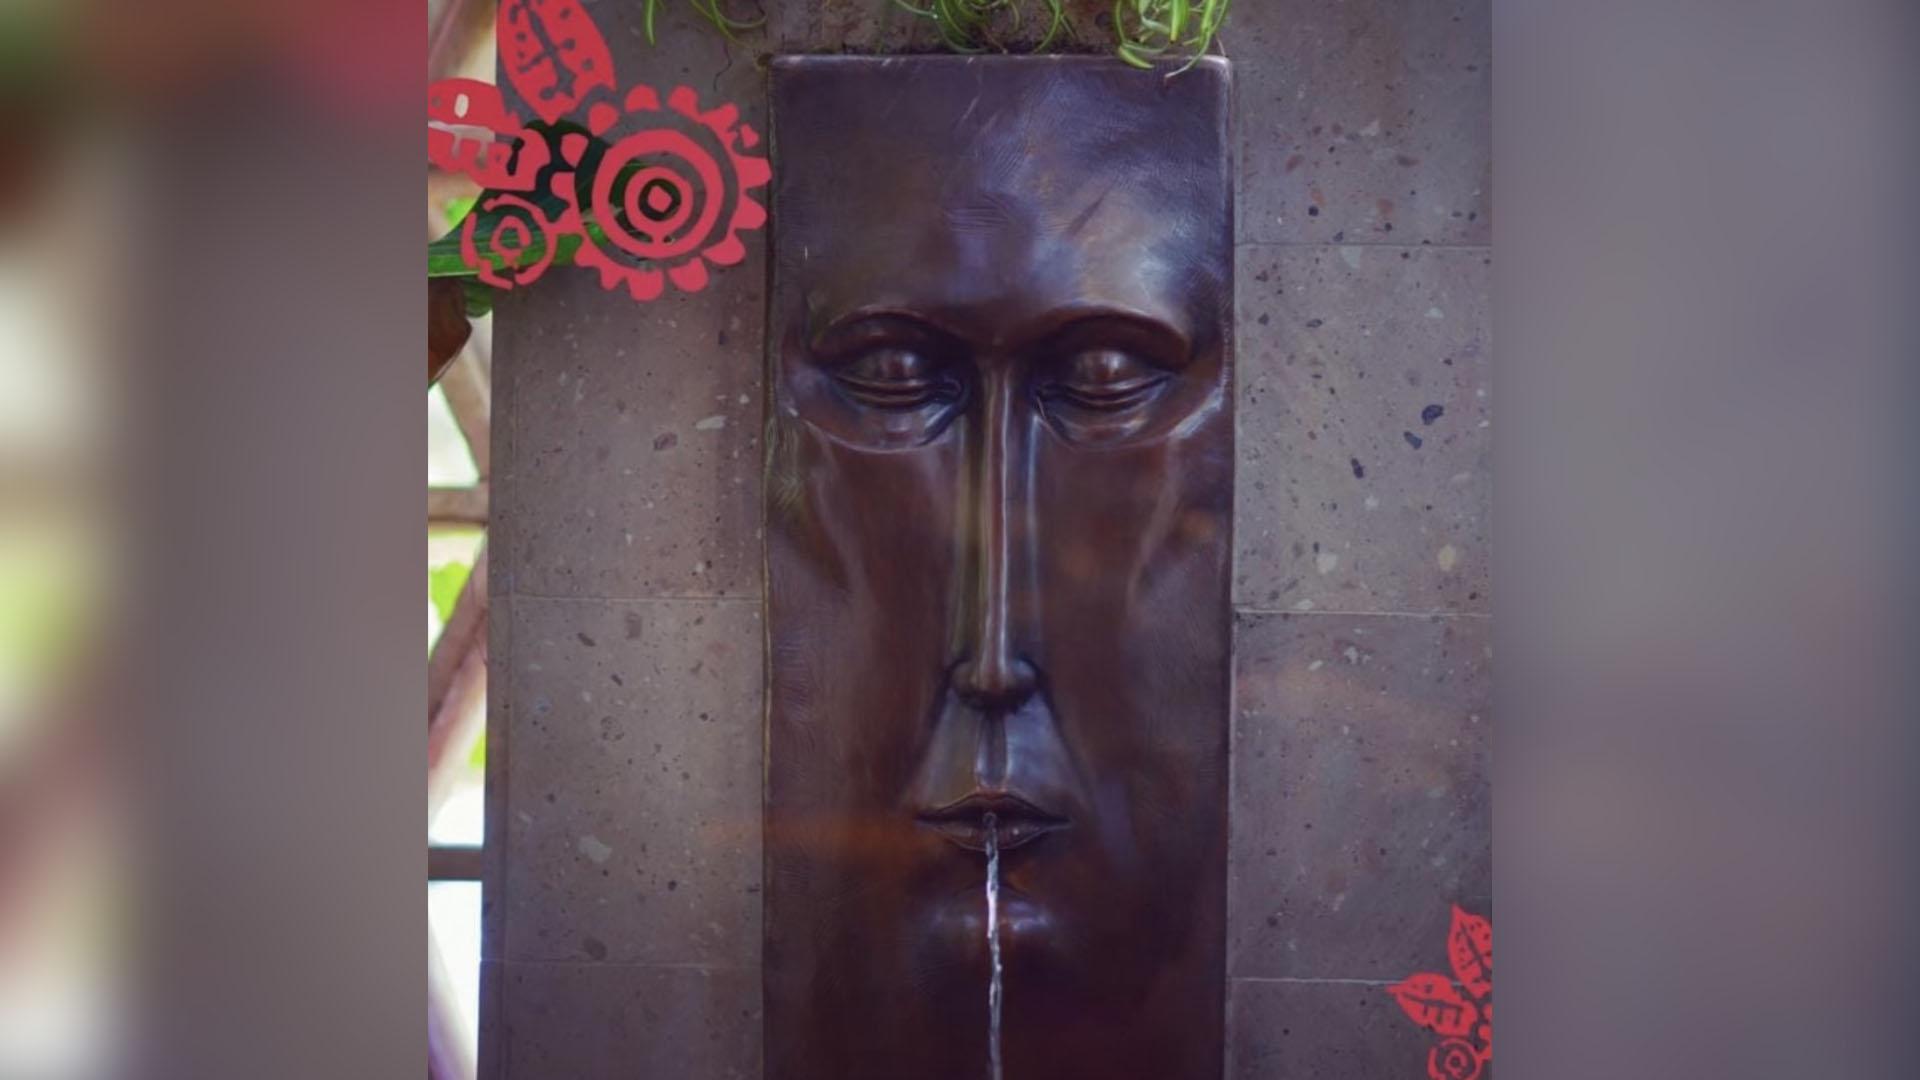 Photo of stolen fountain from Austin's Fonda San Miguel restaurant (Courtesy: Fonda San Miguel)